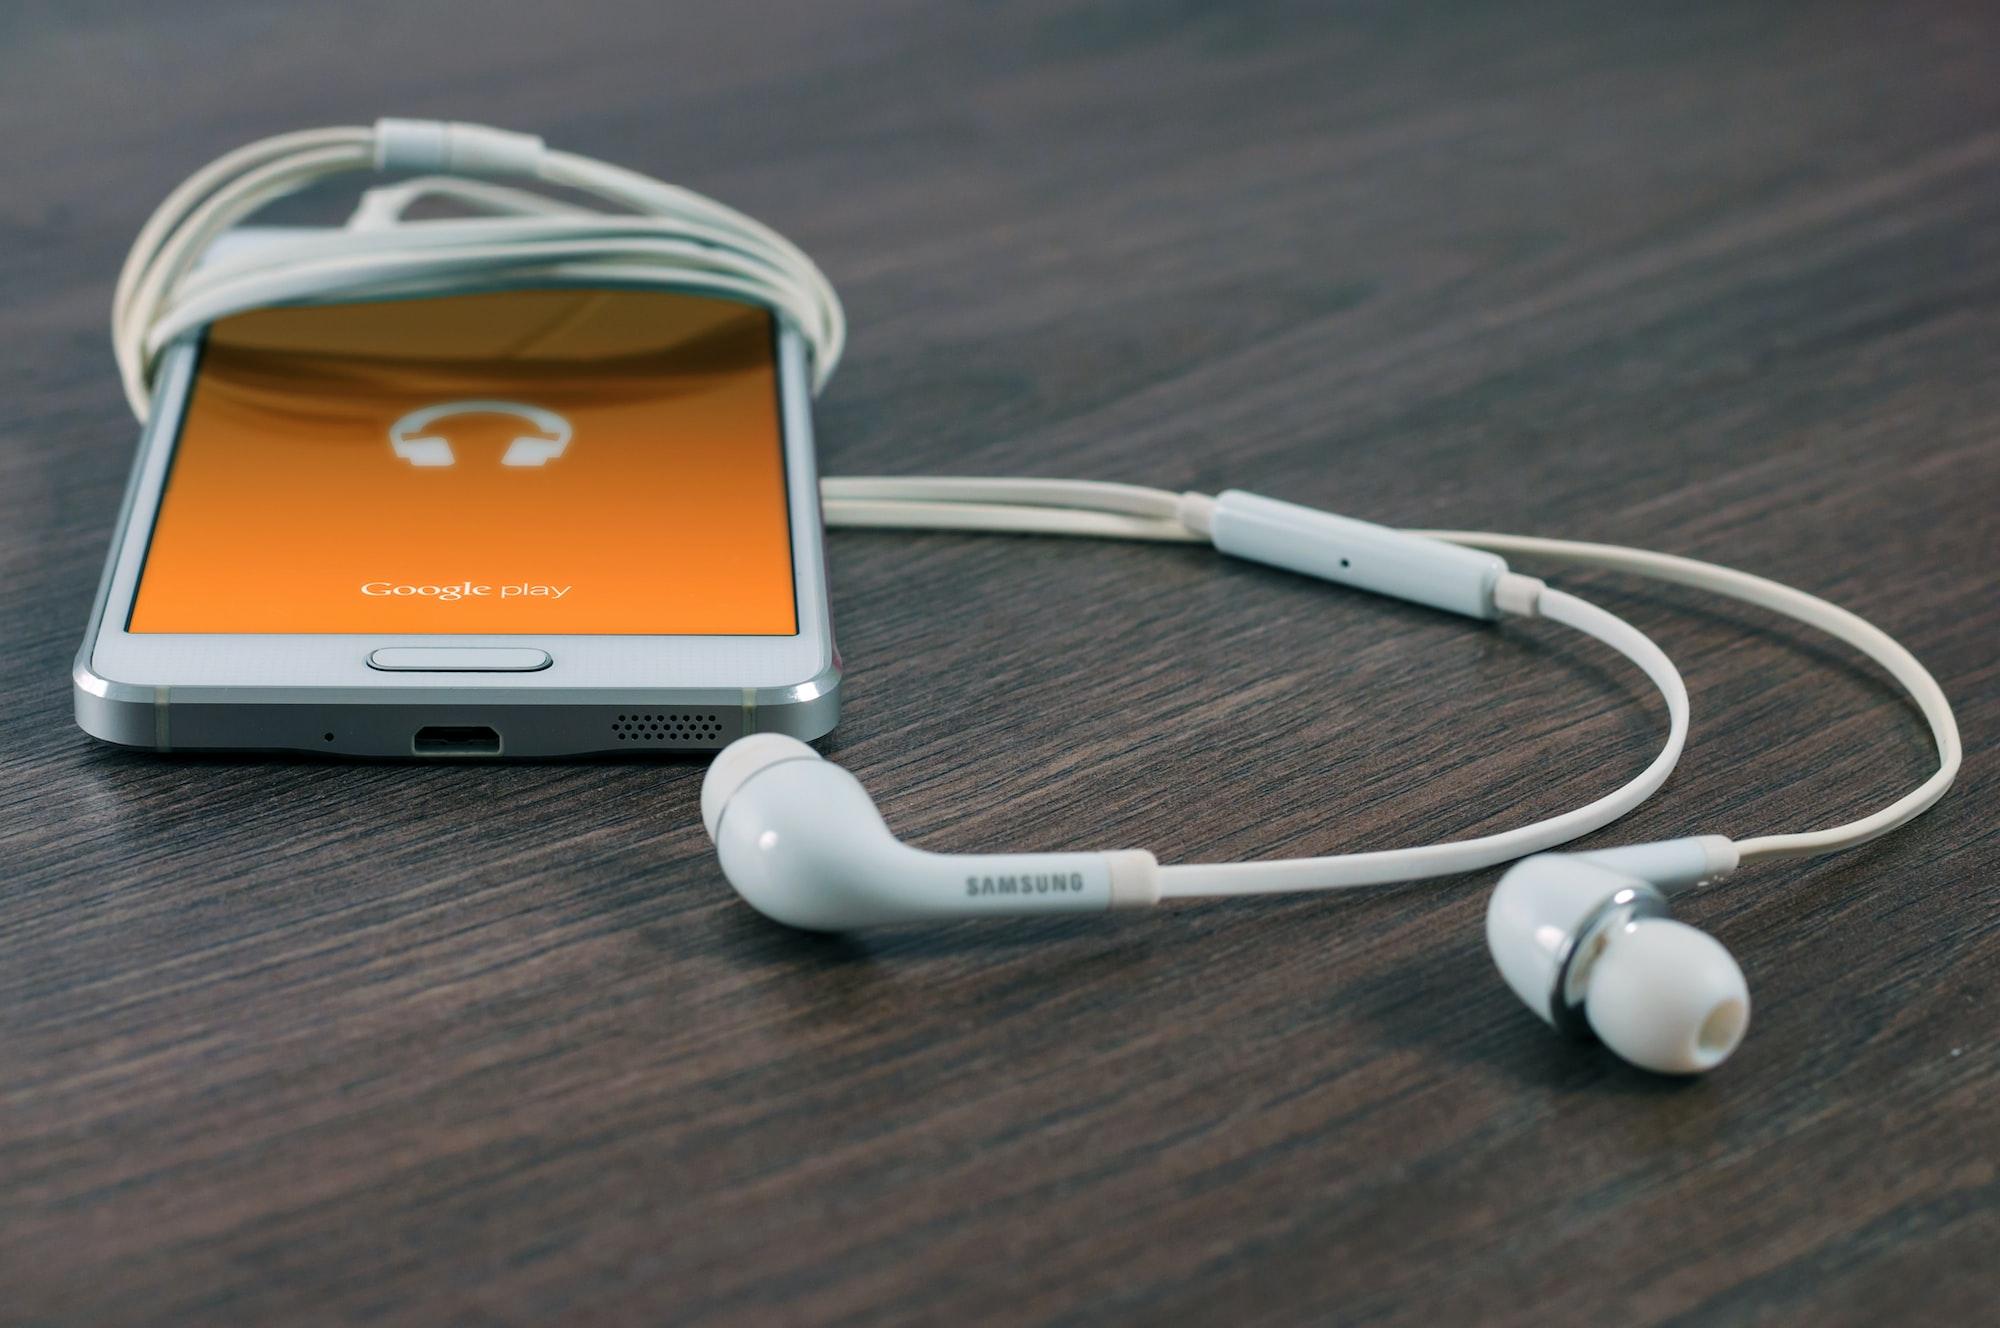 Samsung phones Google play